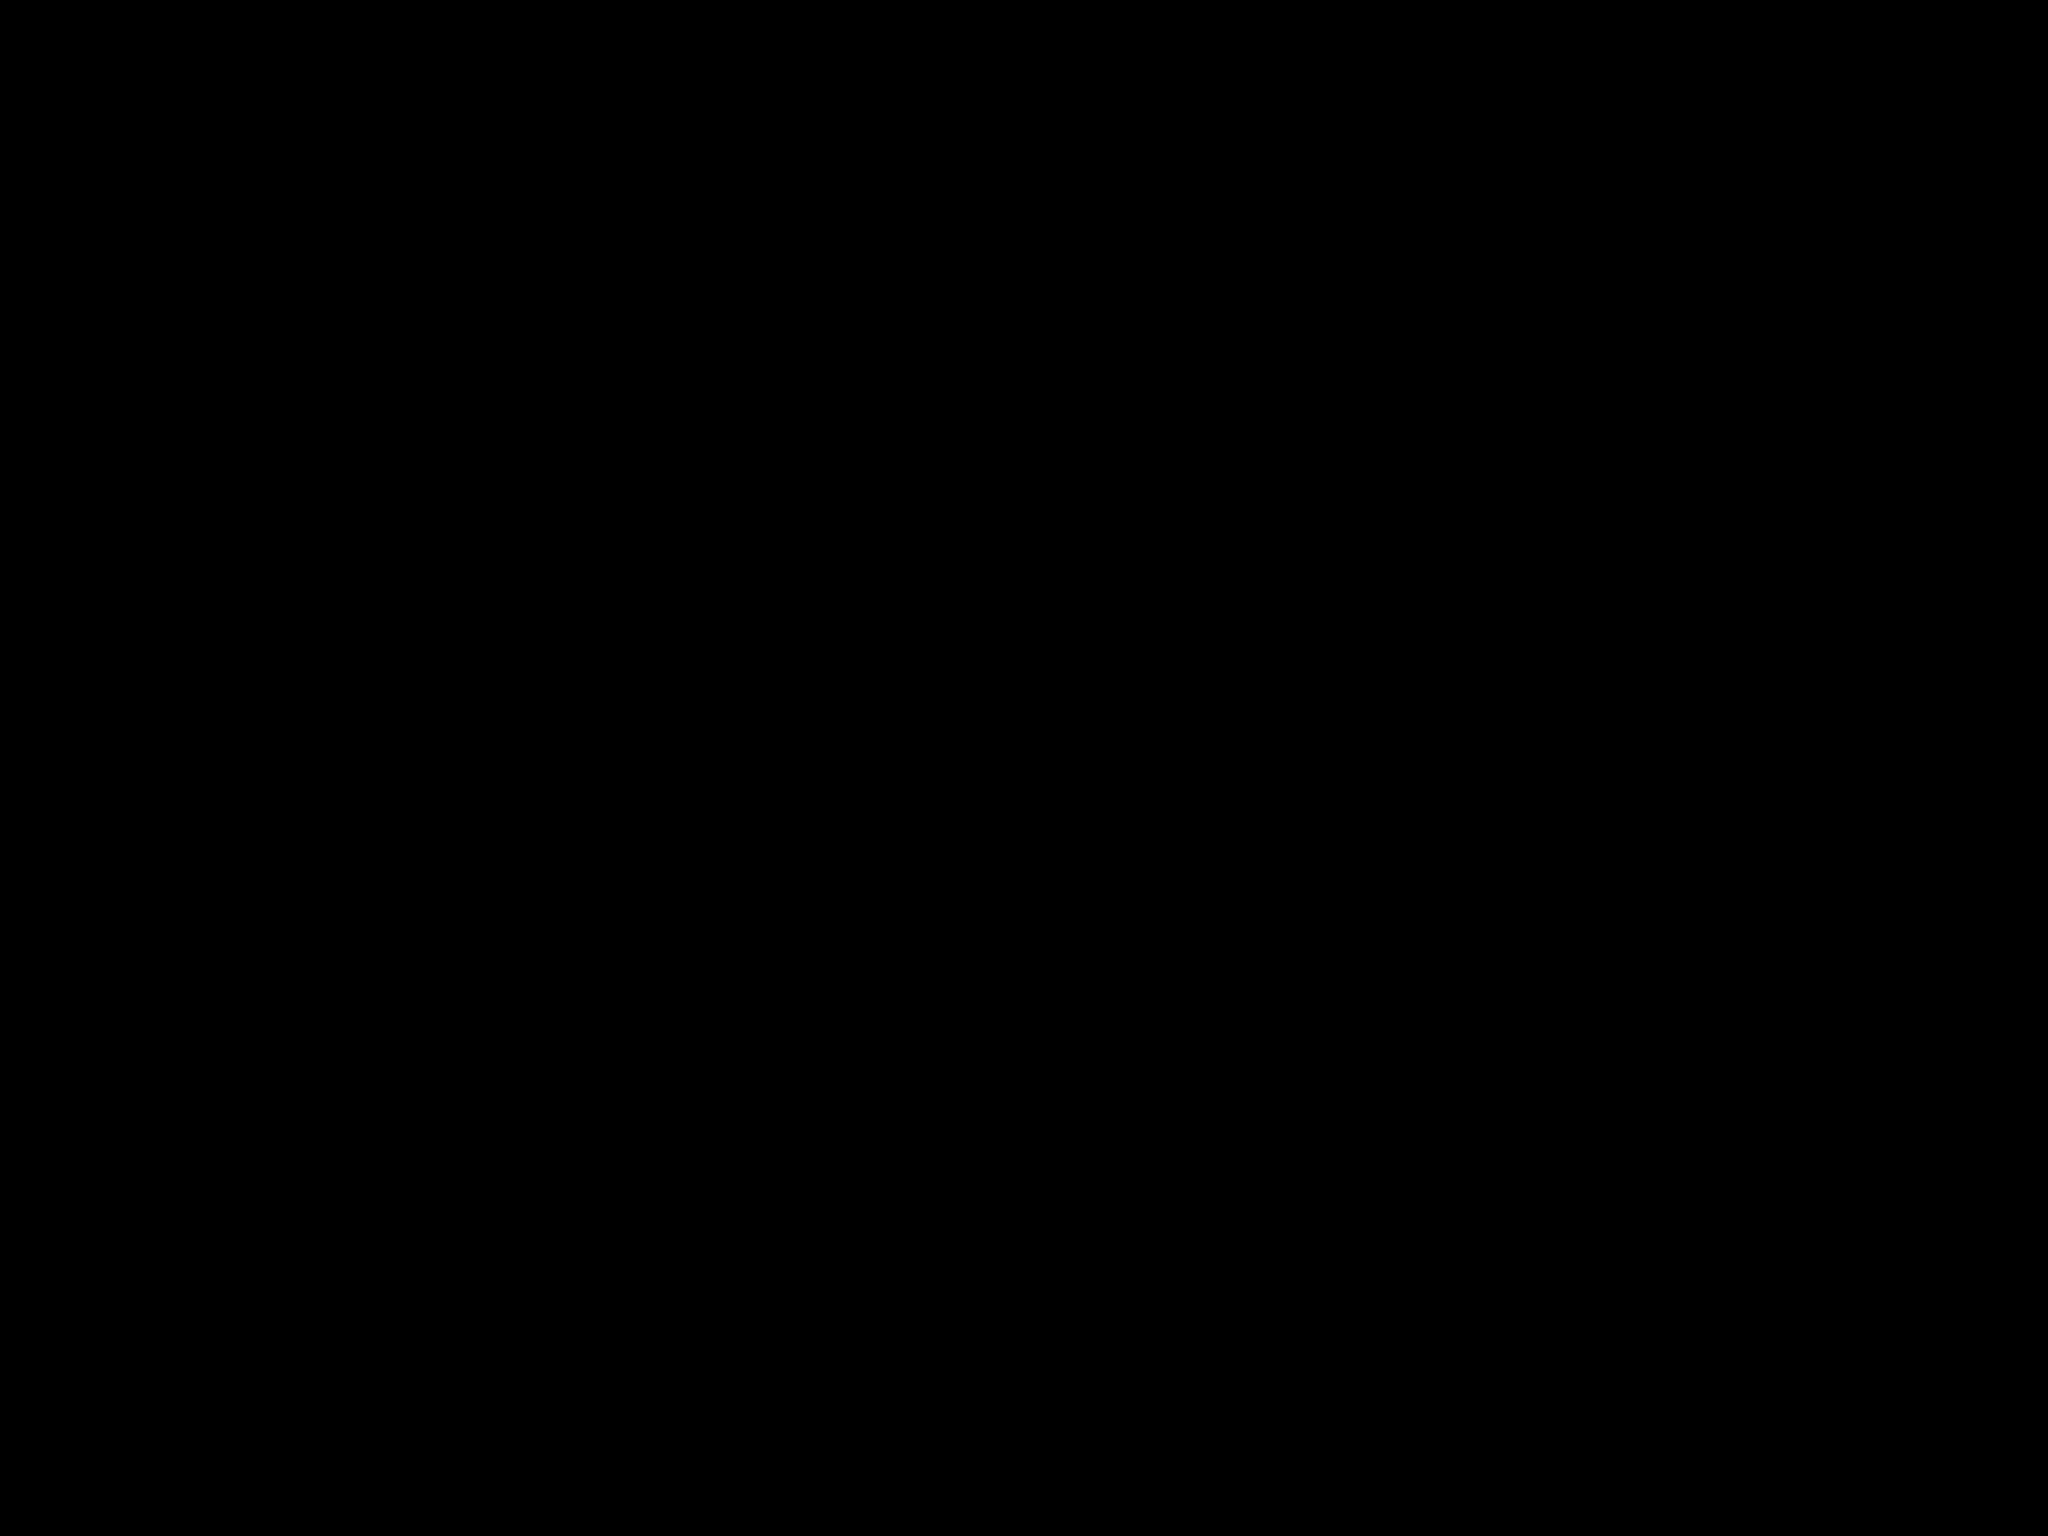 Fotogalerie Zahngesundheit, Wuppi u.v.m.